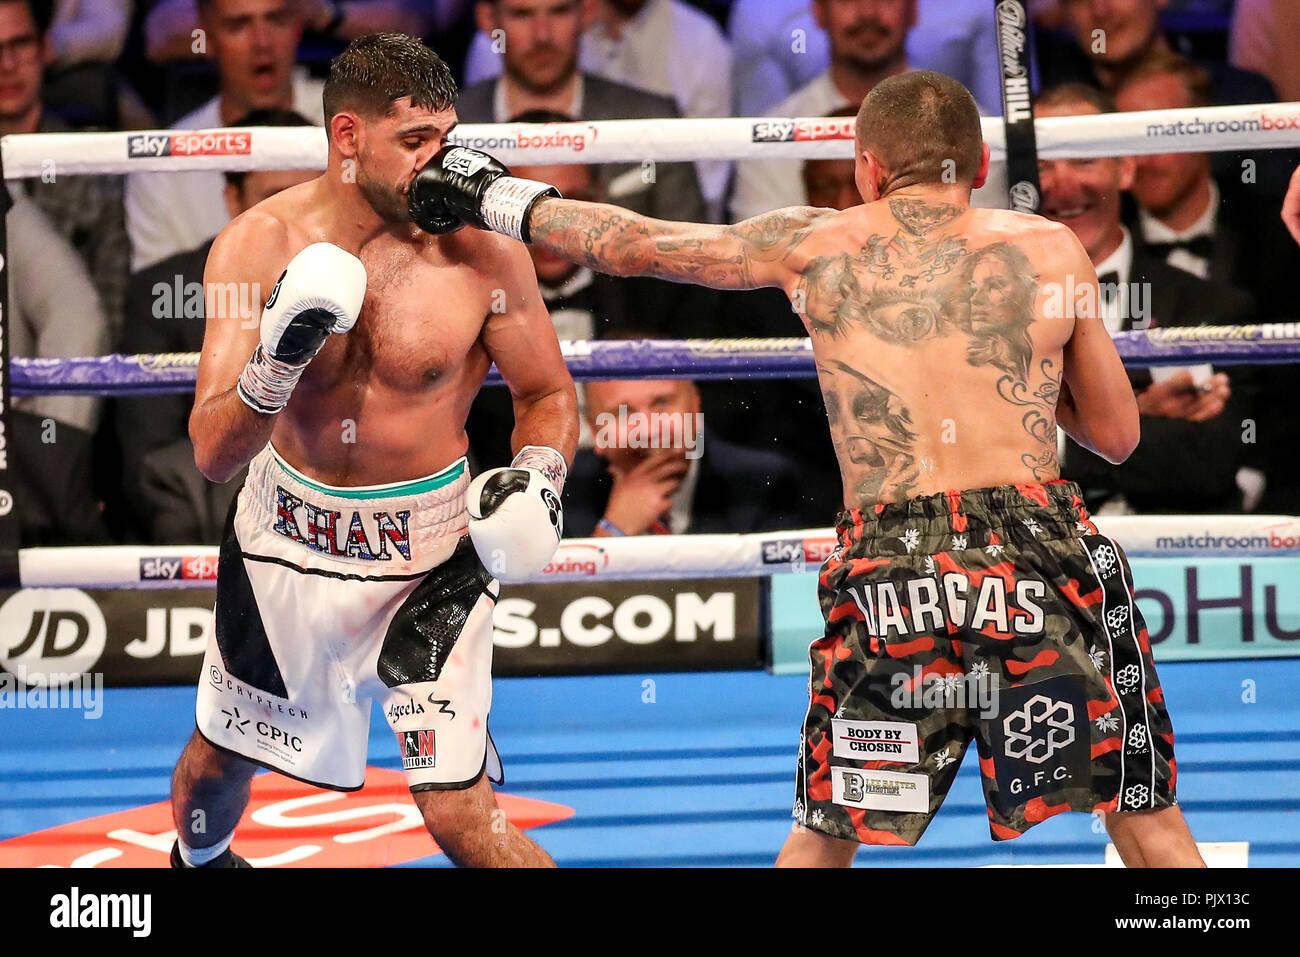 Arena Birmingham, Birmingham, UK. 8th Sep, 2018. Matchroom Boxing, Amir Khan versus Samuel Vargas; Amir Khan (Bolton) on his way to beating Samuel Vargas (Toronto, Canada) Credit: Action Plus Sports/Alamy Live News - Stock Image